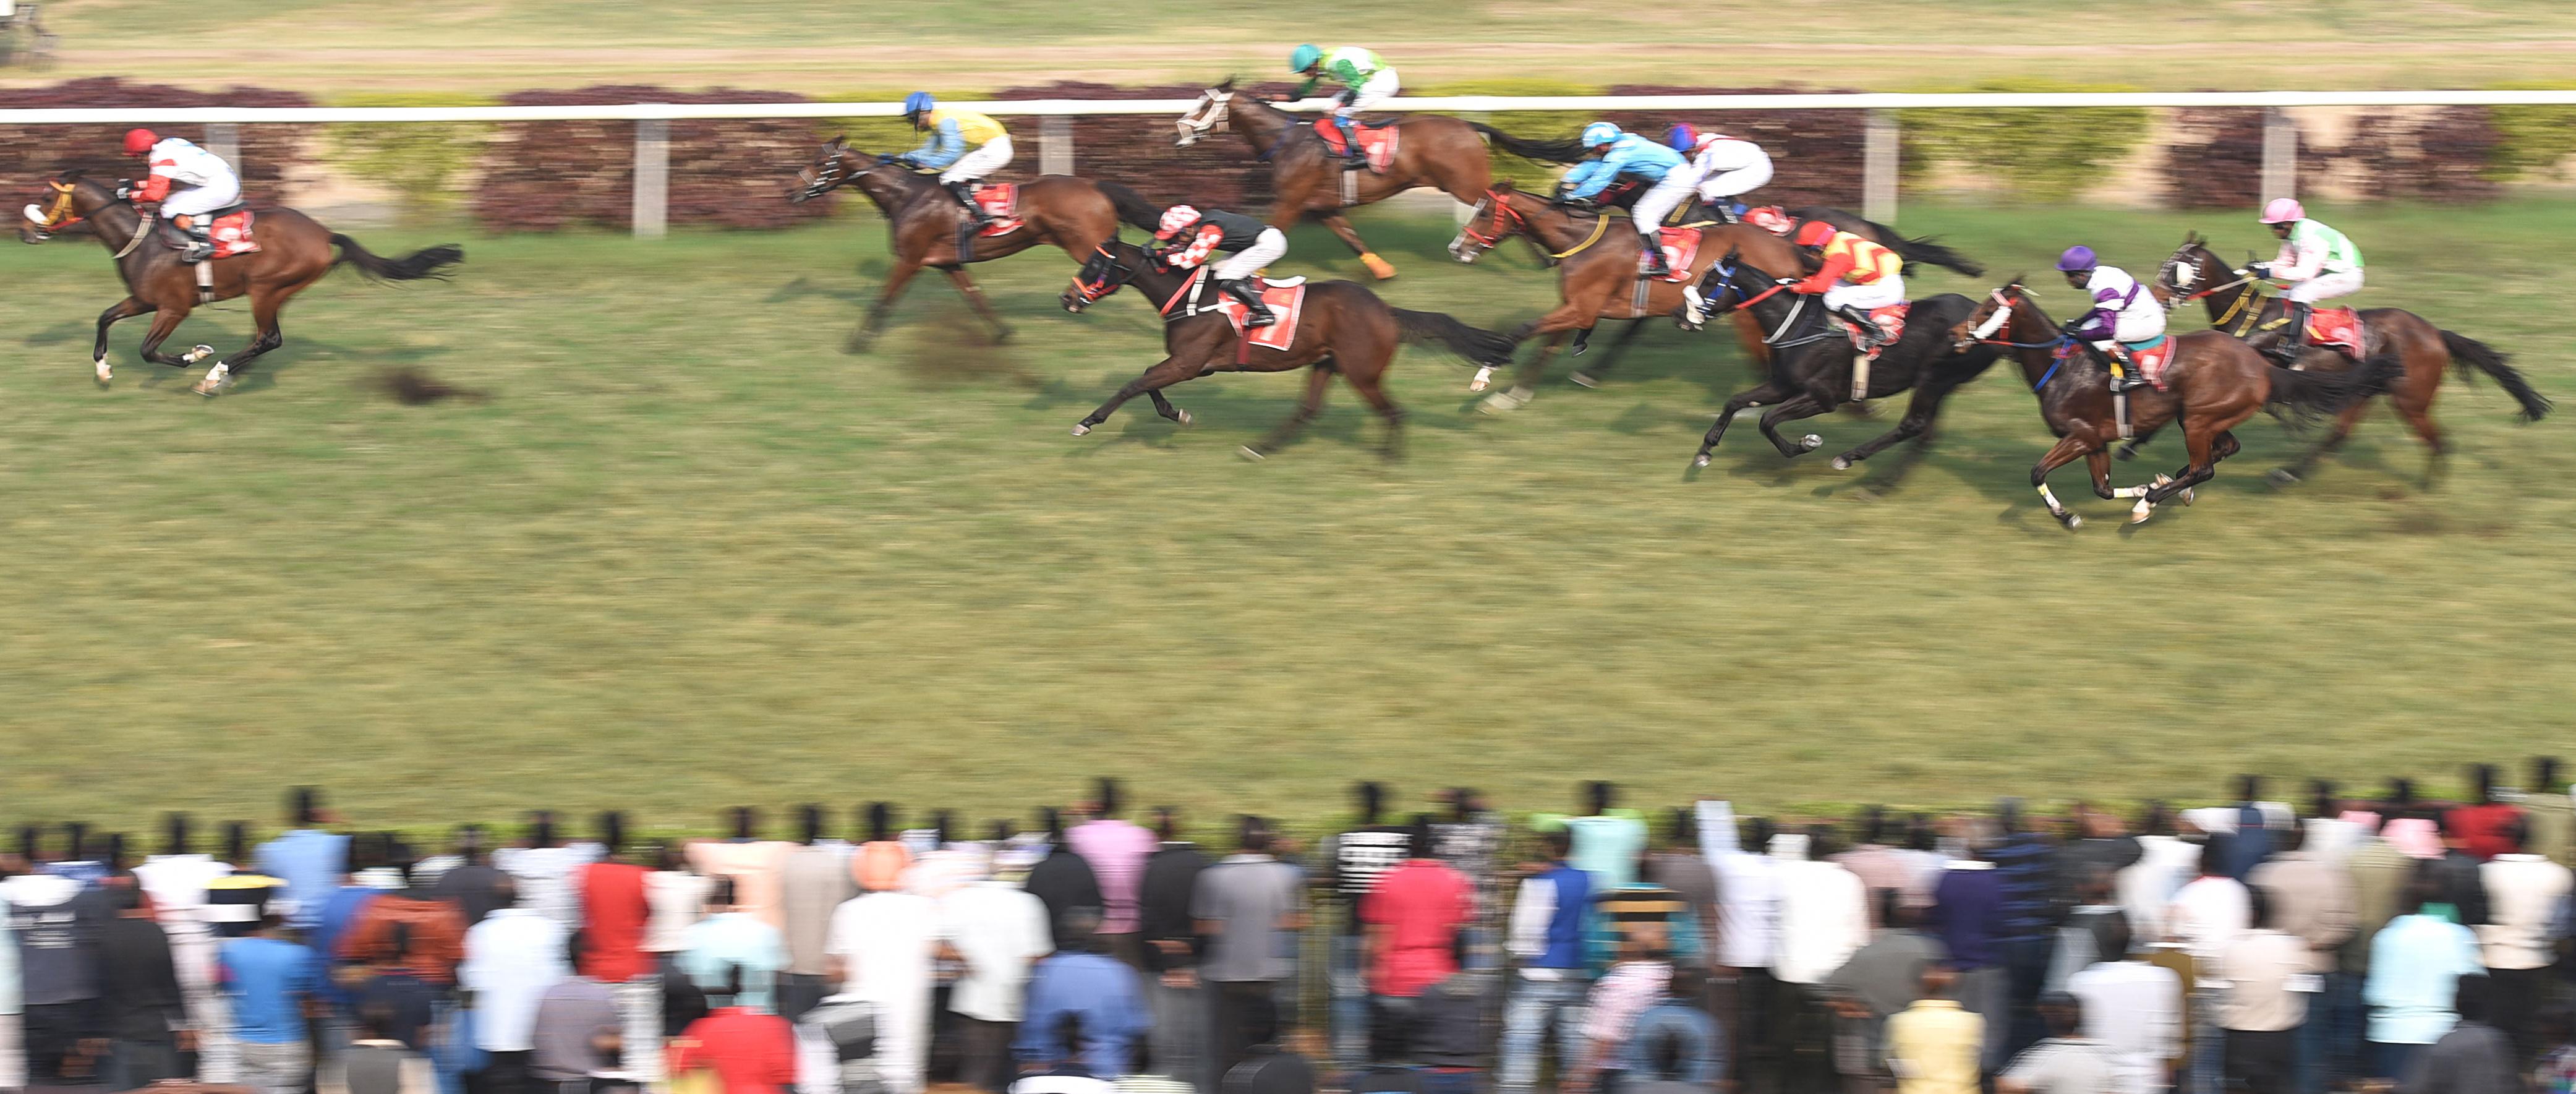 Racing at the Calcutta racecourse